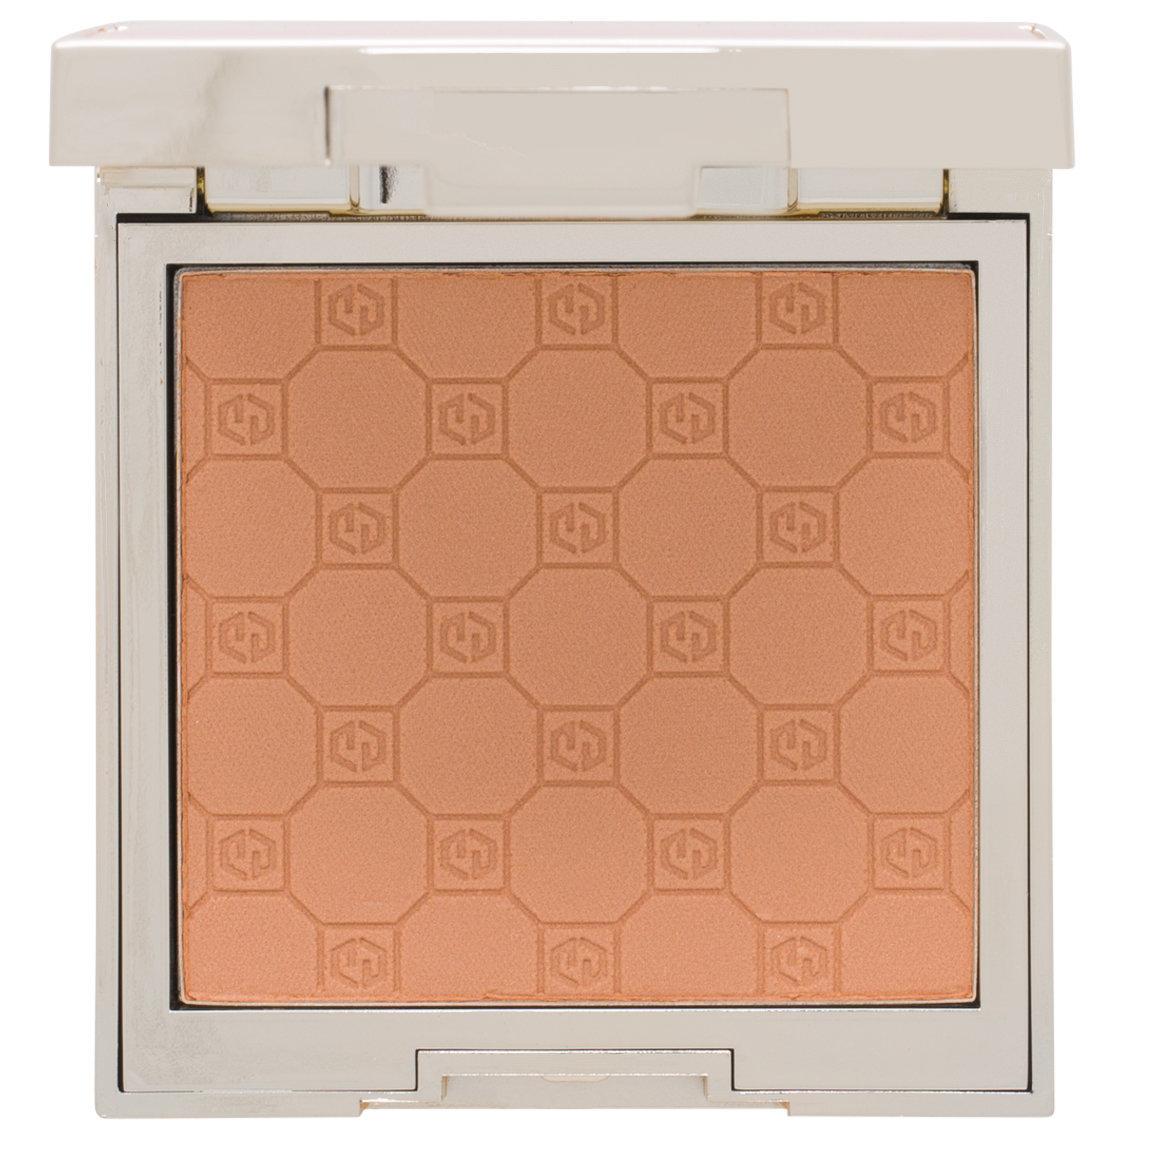 Jouer Cosmetics Soft Focus Hydrate + Set Powder Medium alternative view 1 - product swatch.